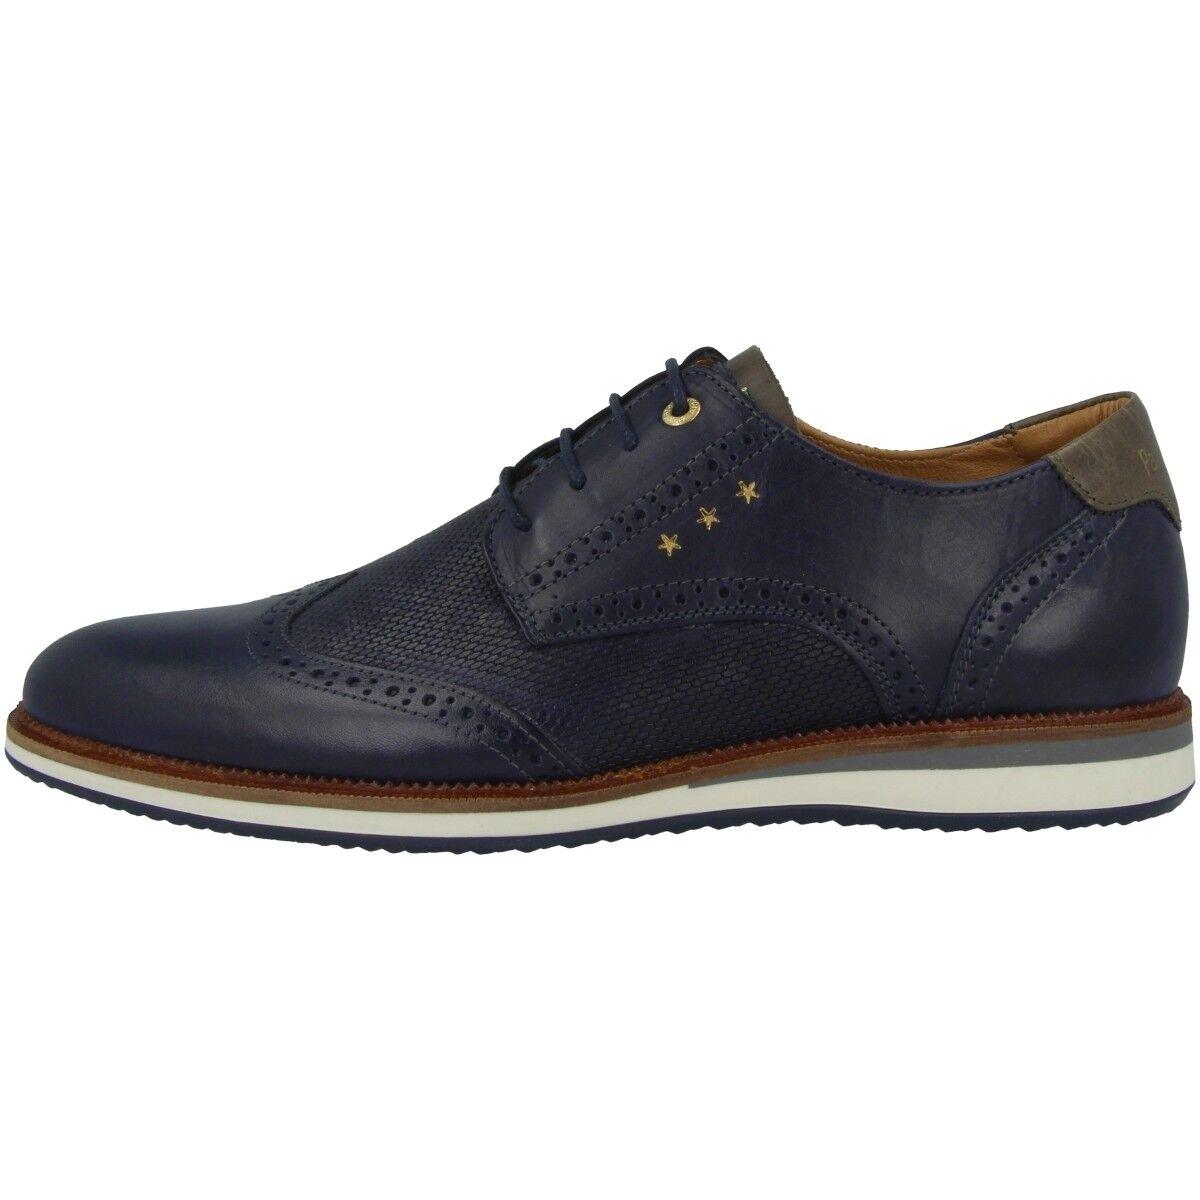 Pantofola D oro Rubicon hombres Low Cut Zapatillas Deportivas Hombre azuls